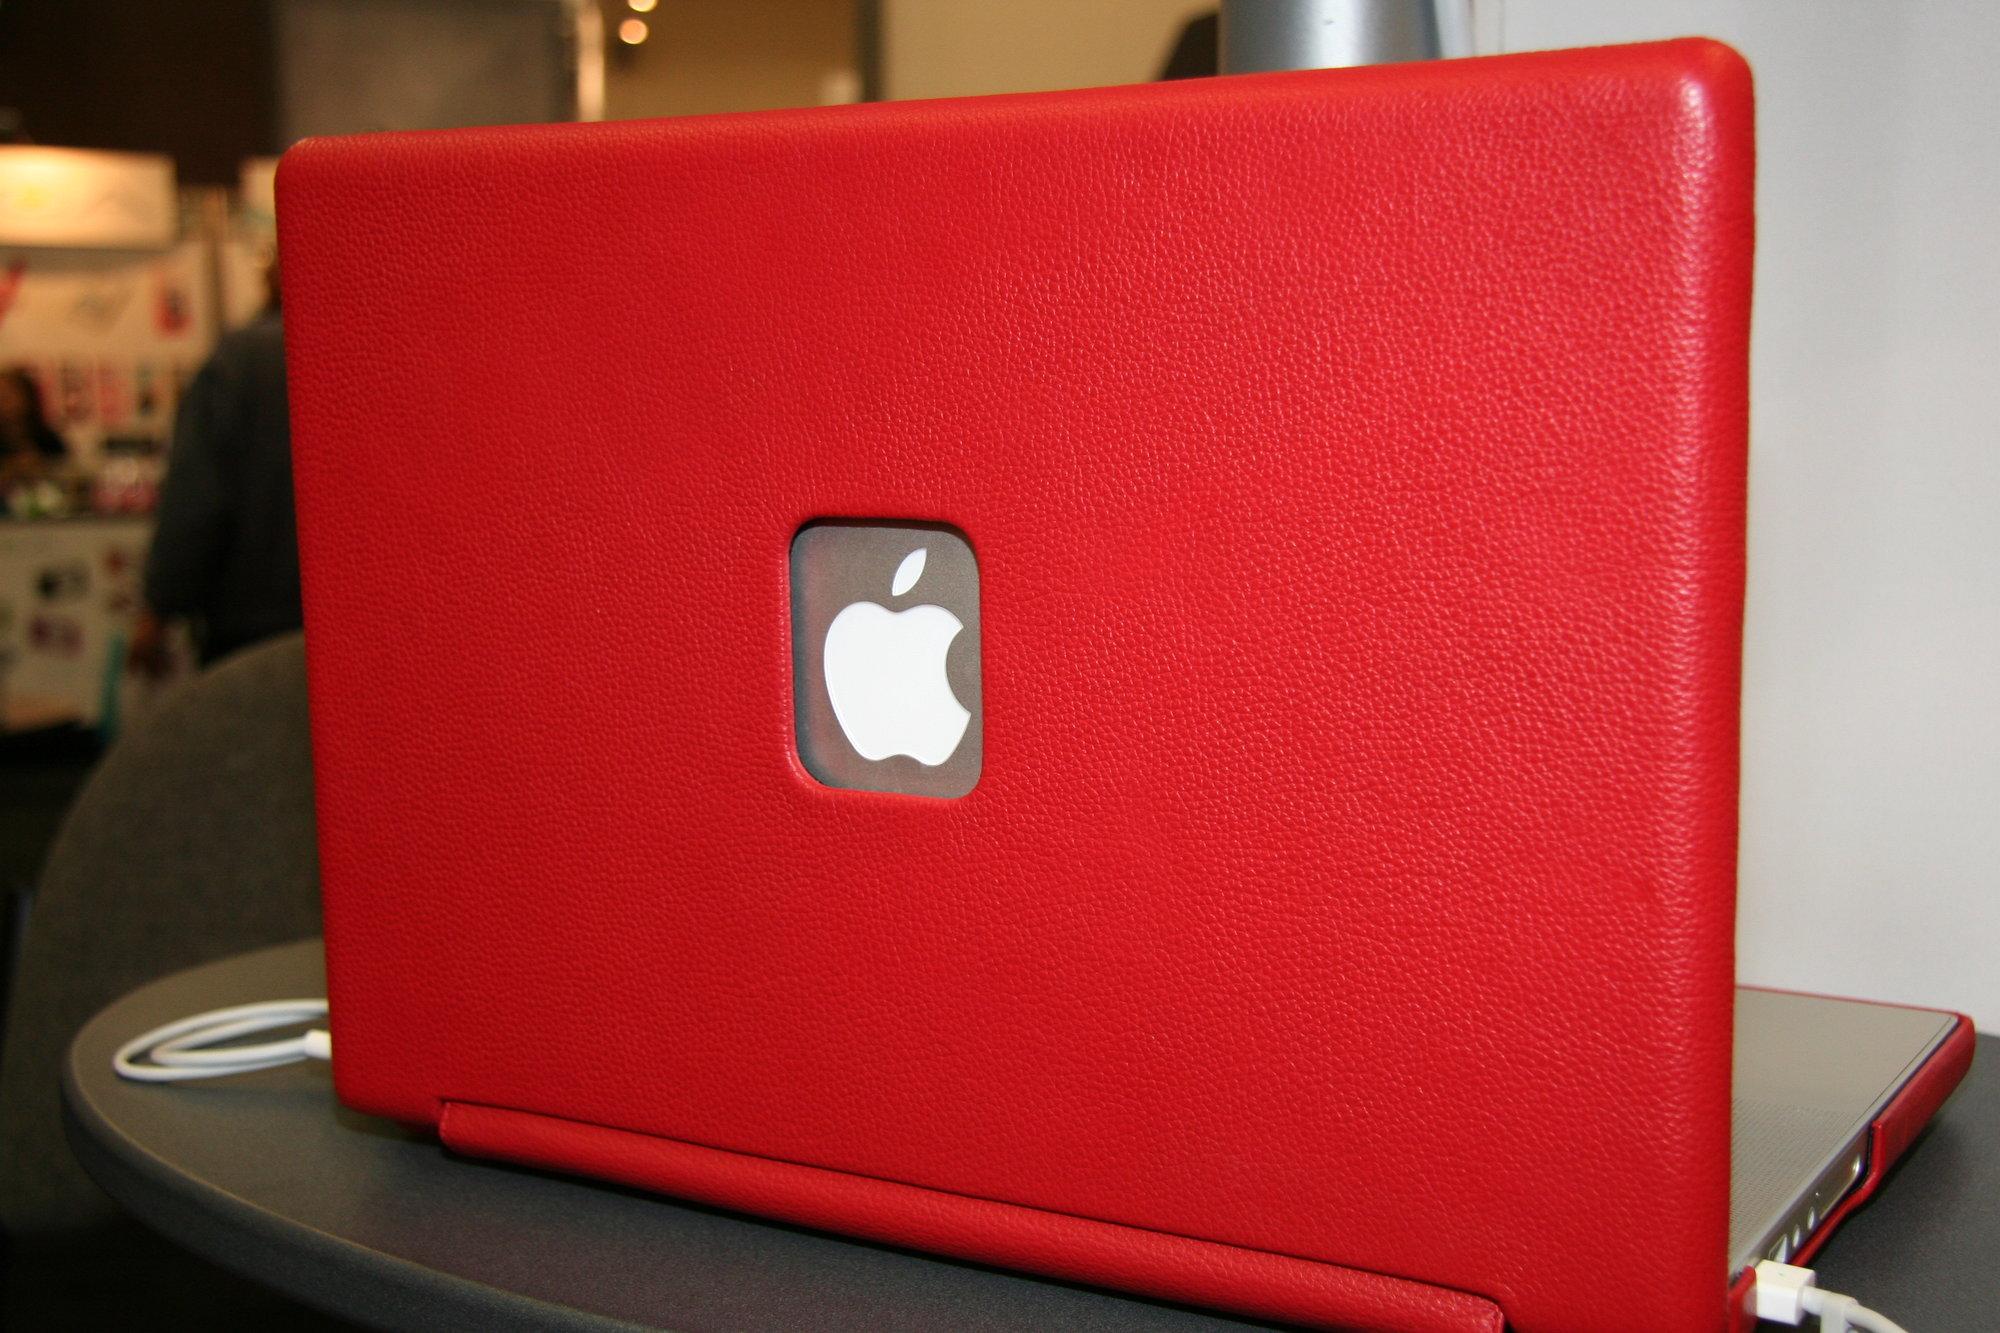 Enda et skinncover til MacBook. Denne gangen i rødt.